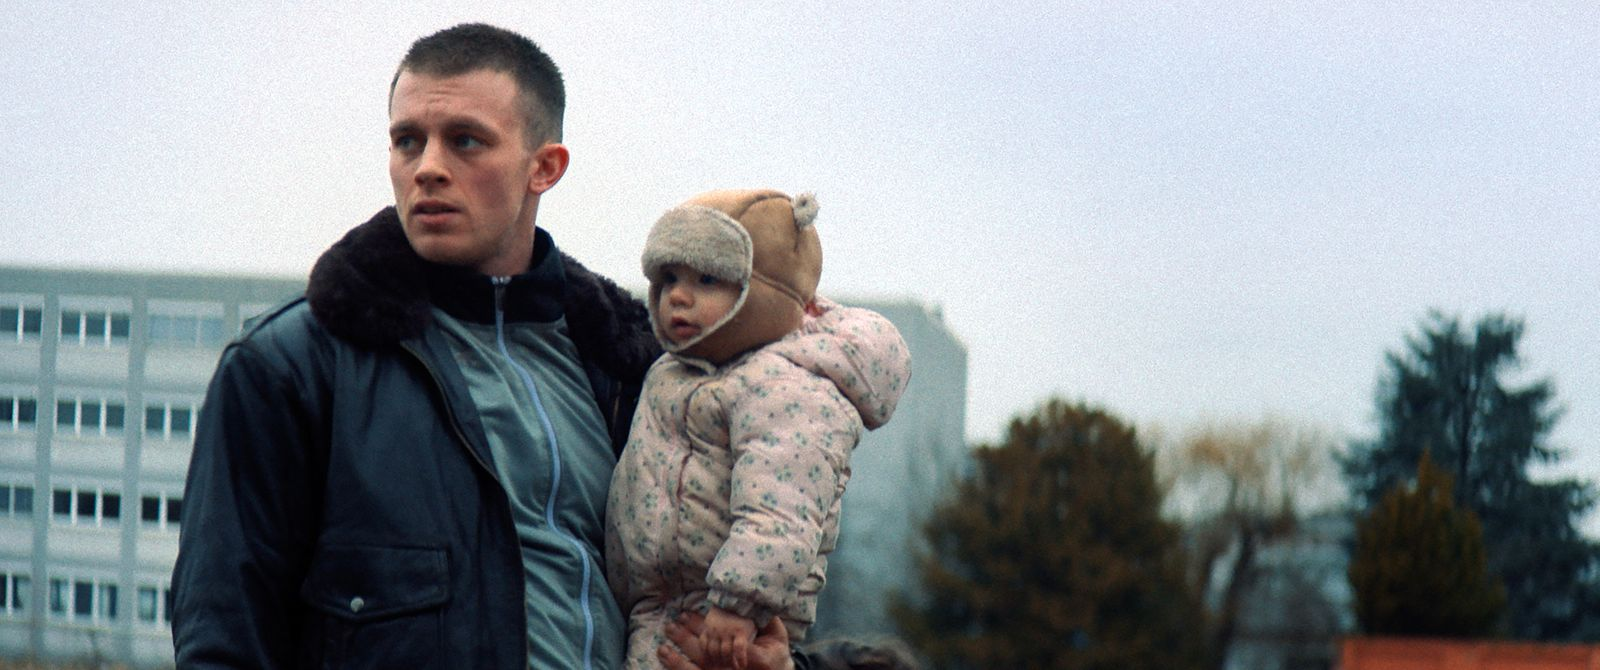 Berlinale/ Perspektive Deutsches Kino/ Kids Run